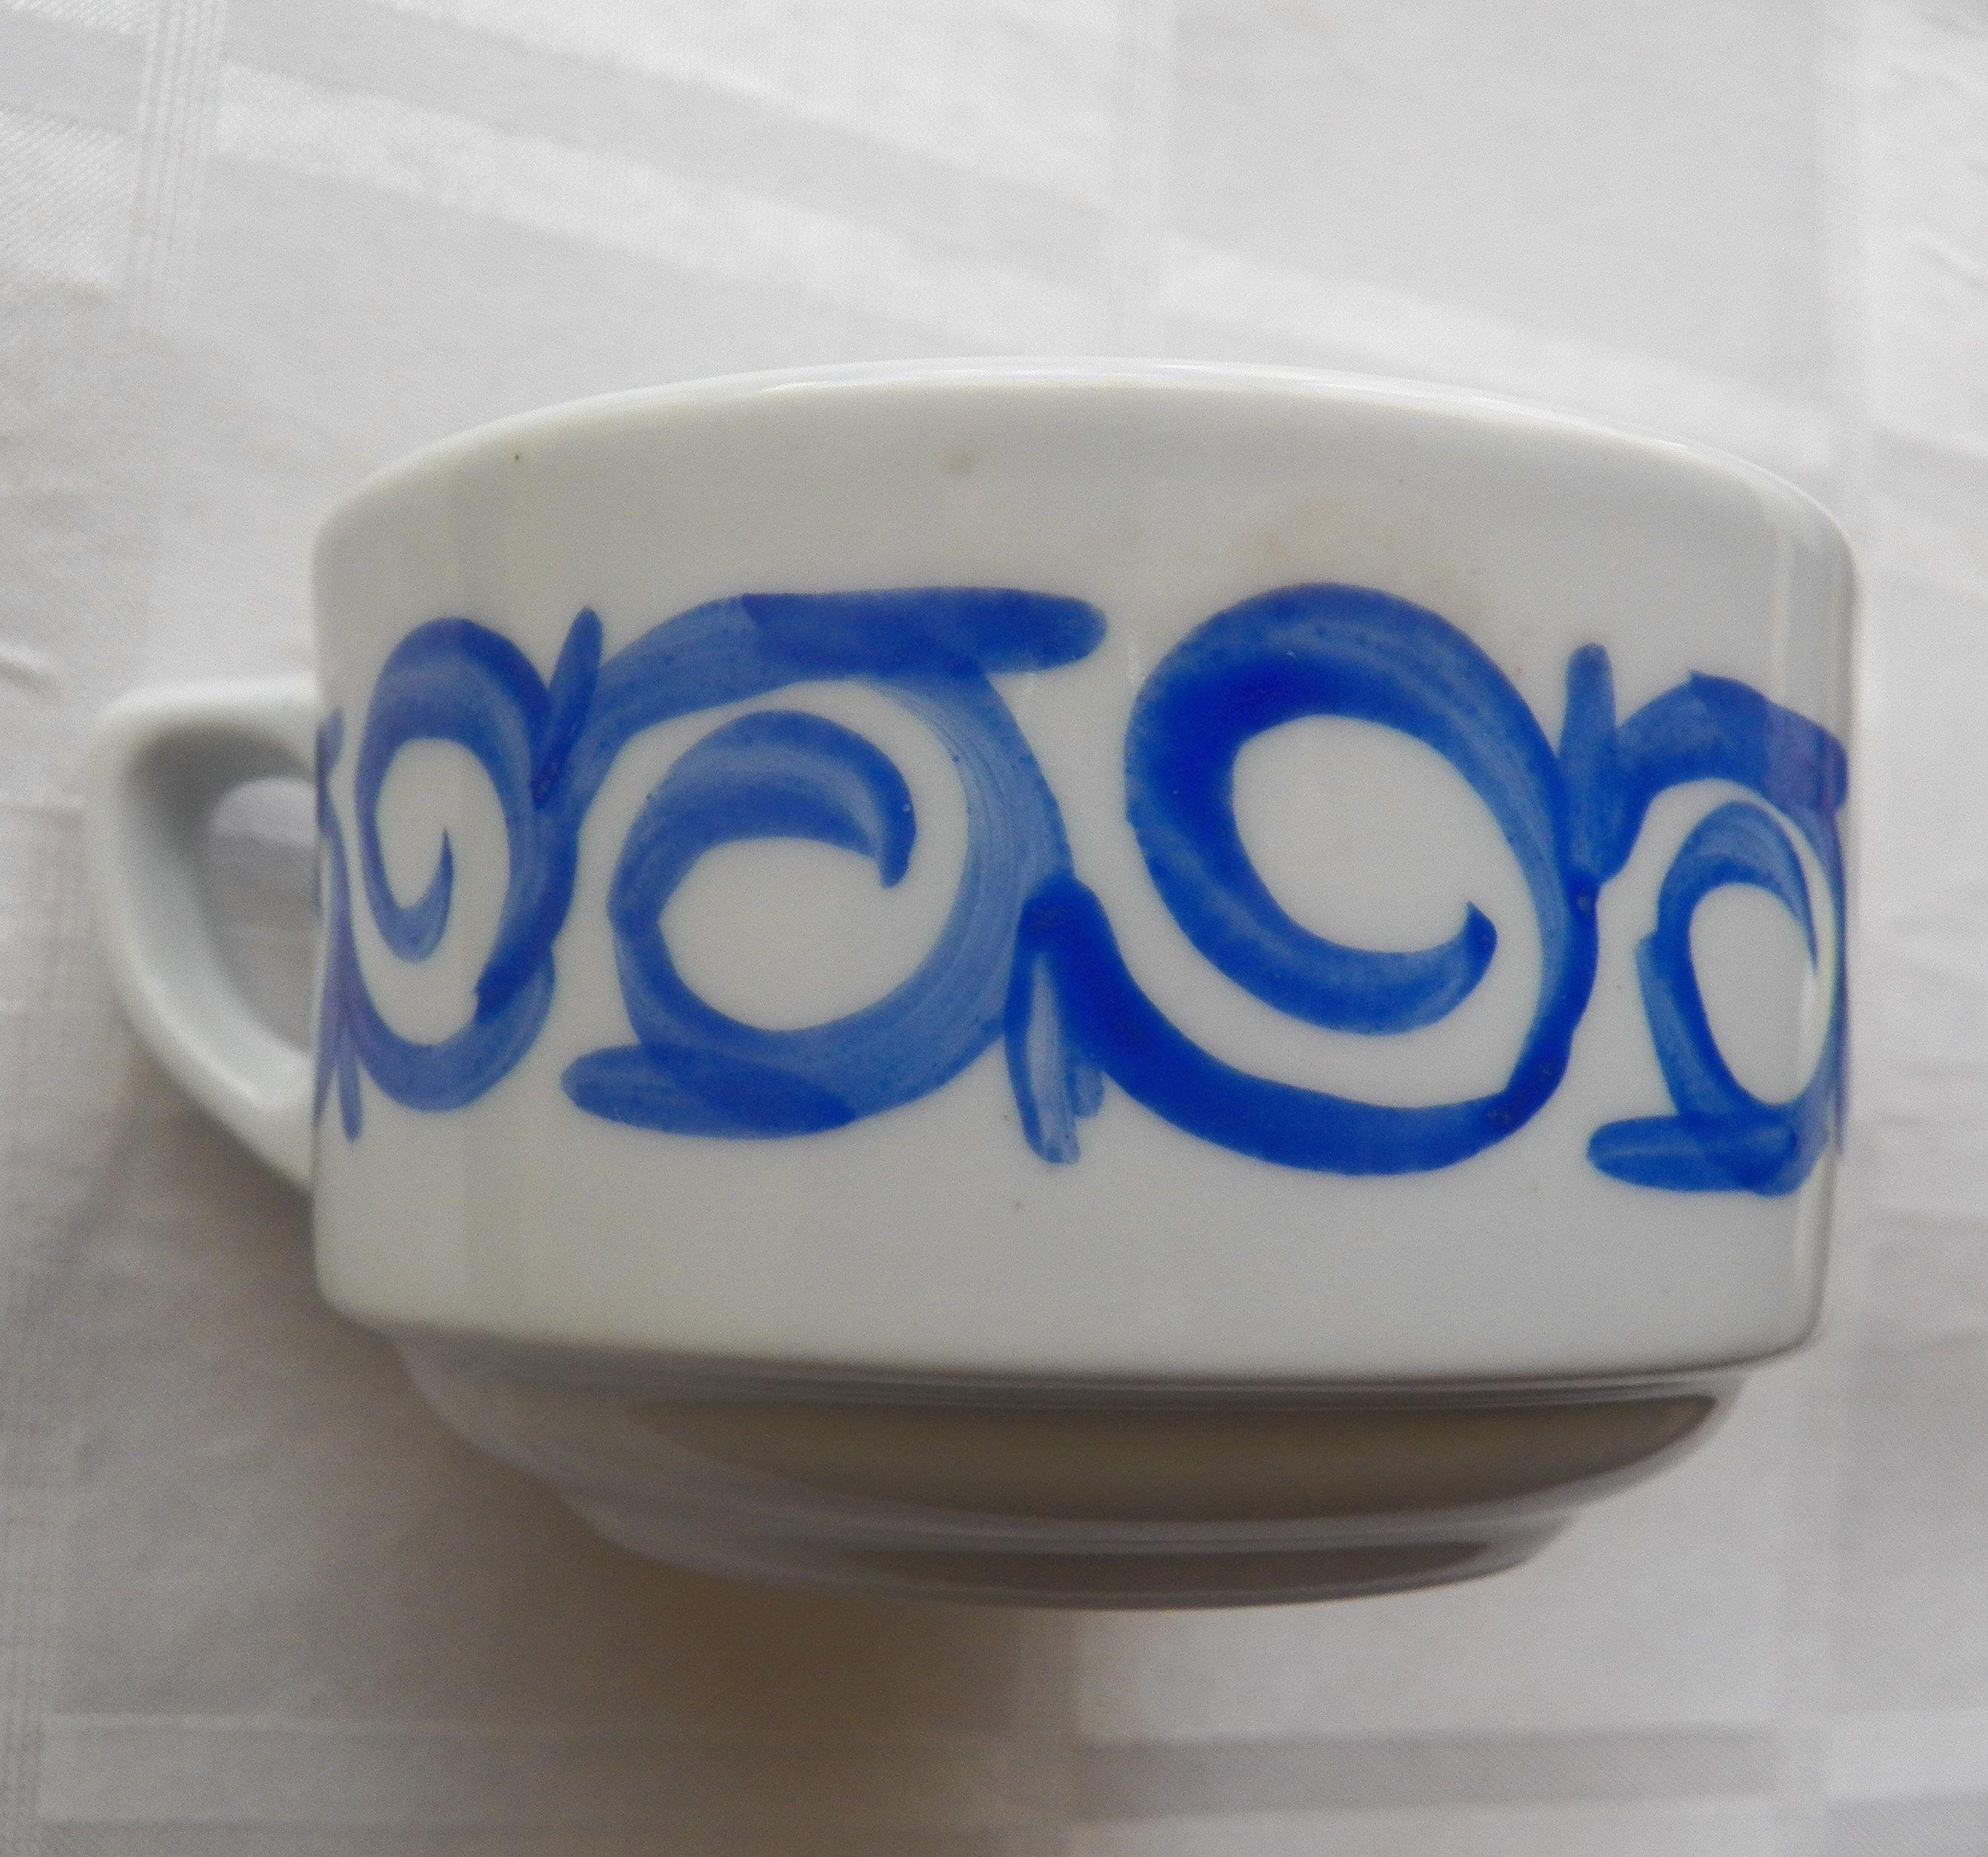 !!!PRESUMED SOLD!!! - Garage Sale: Cups, Jugs, Knockbox